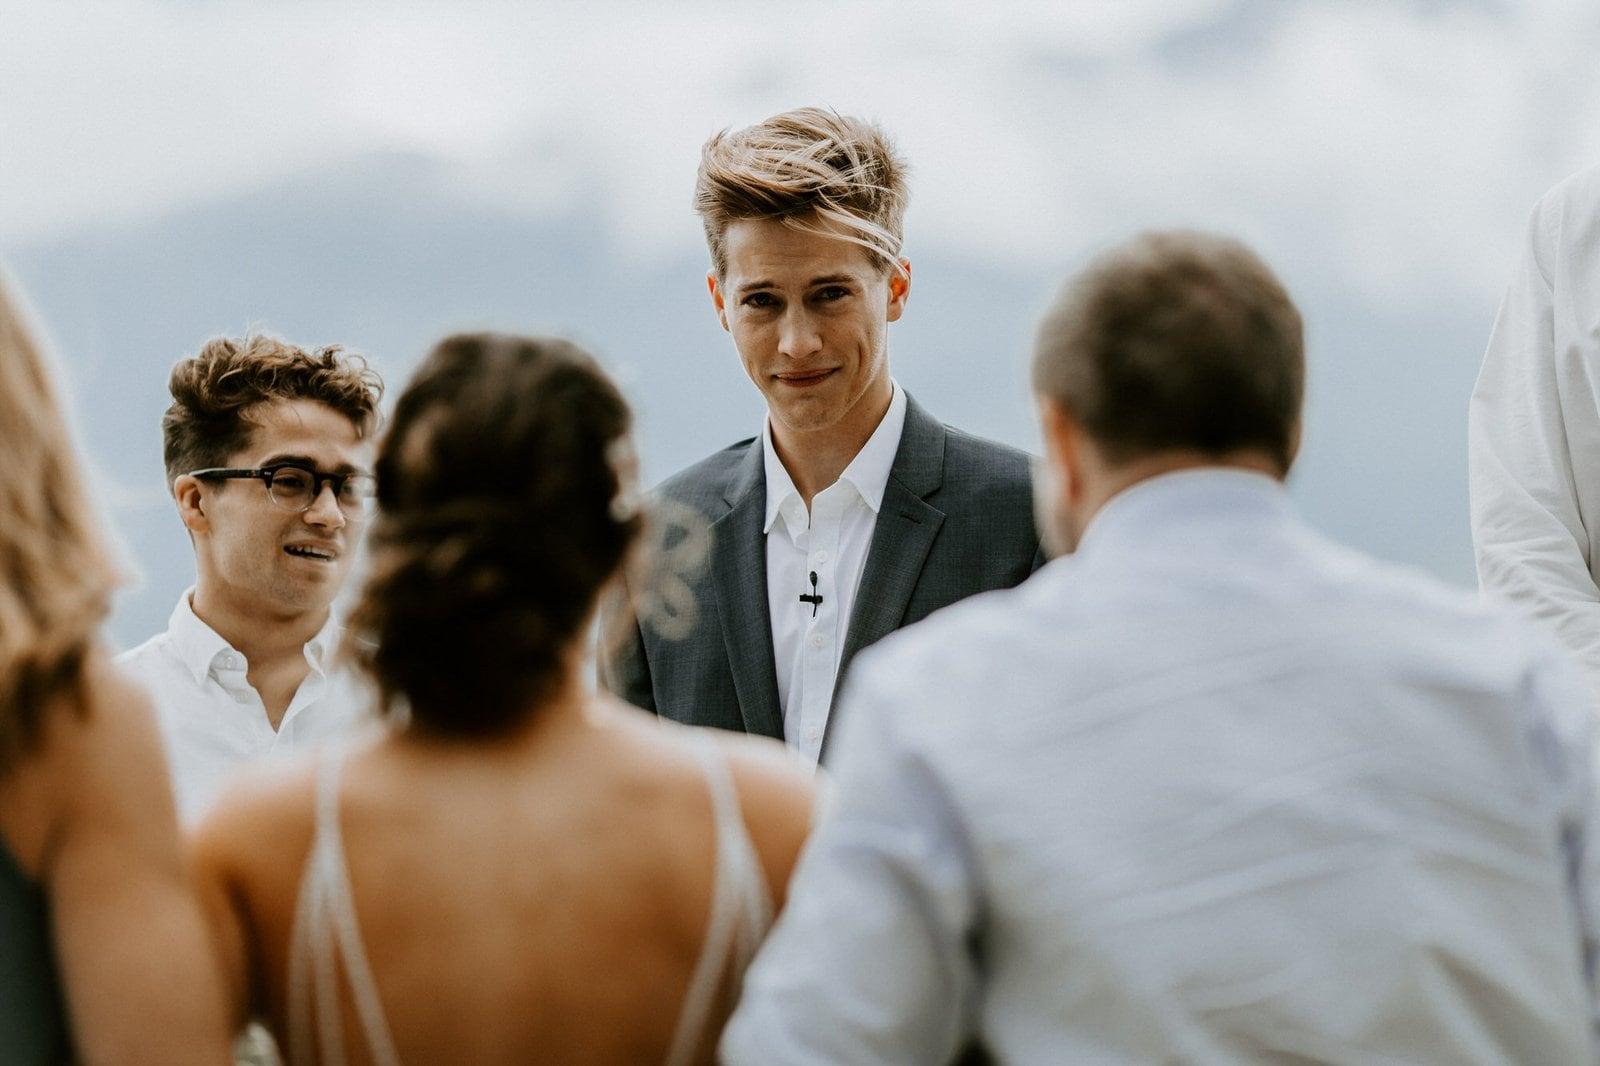 groom's first look reaction.